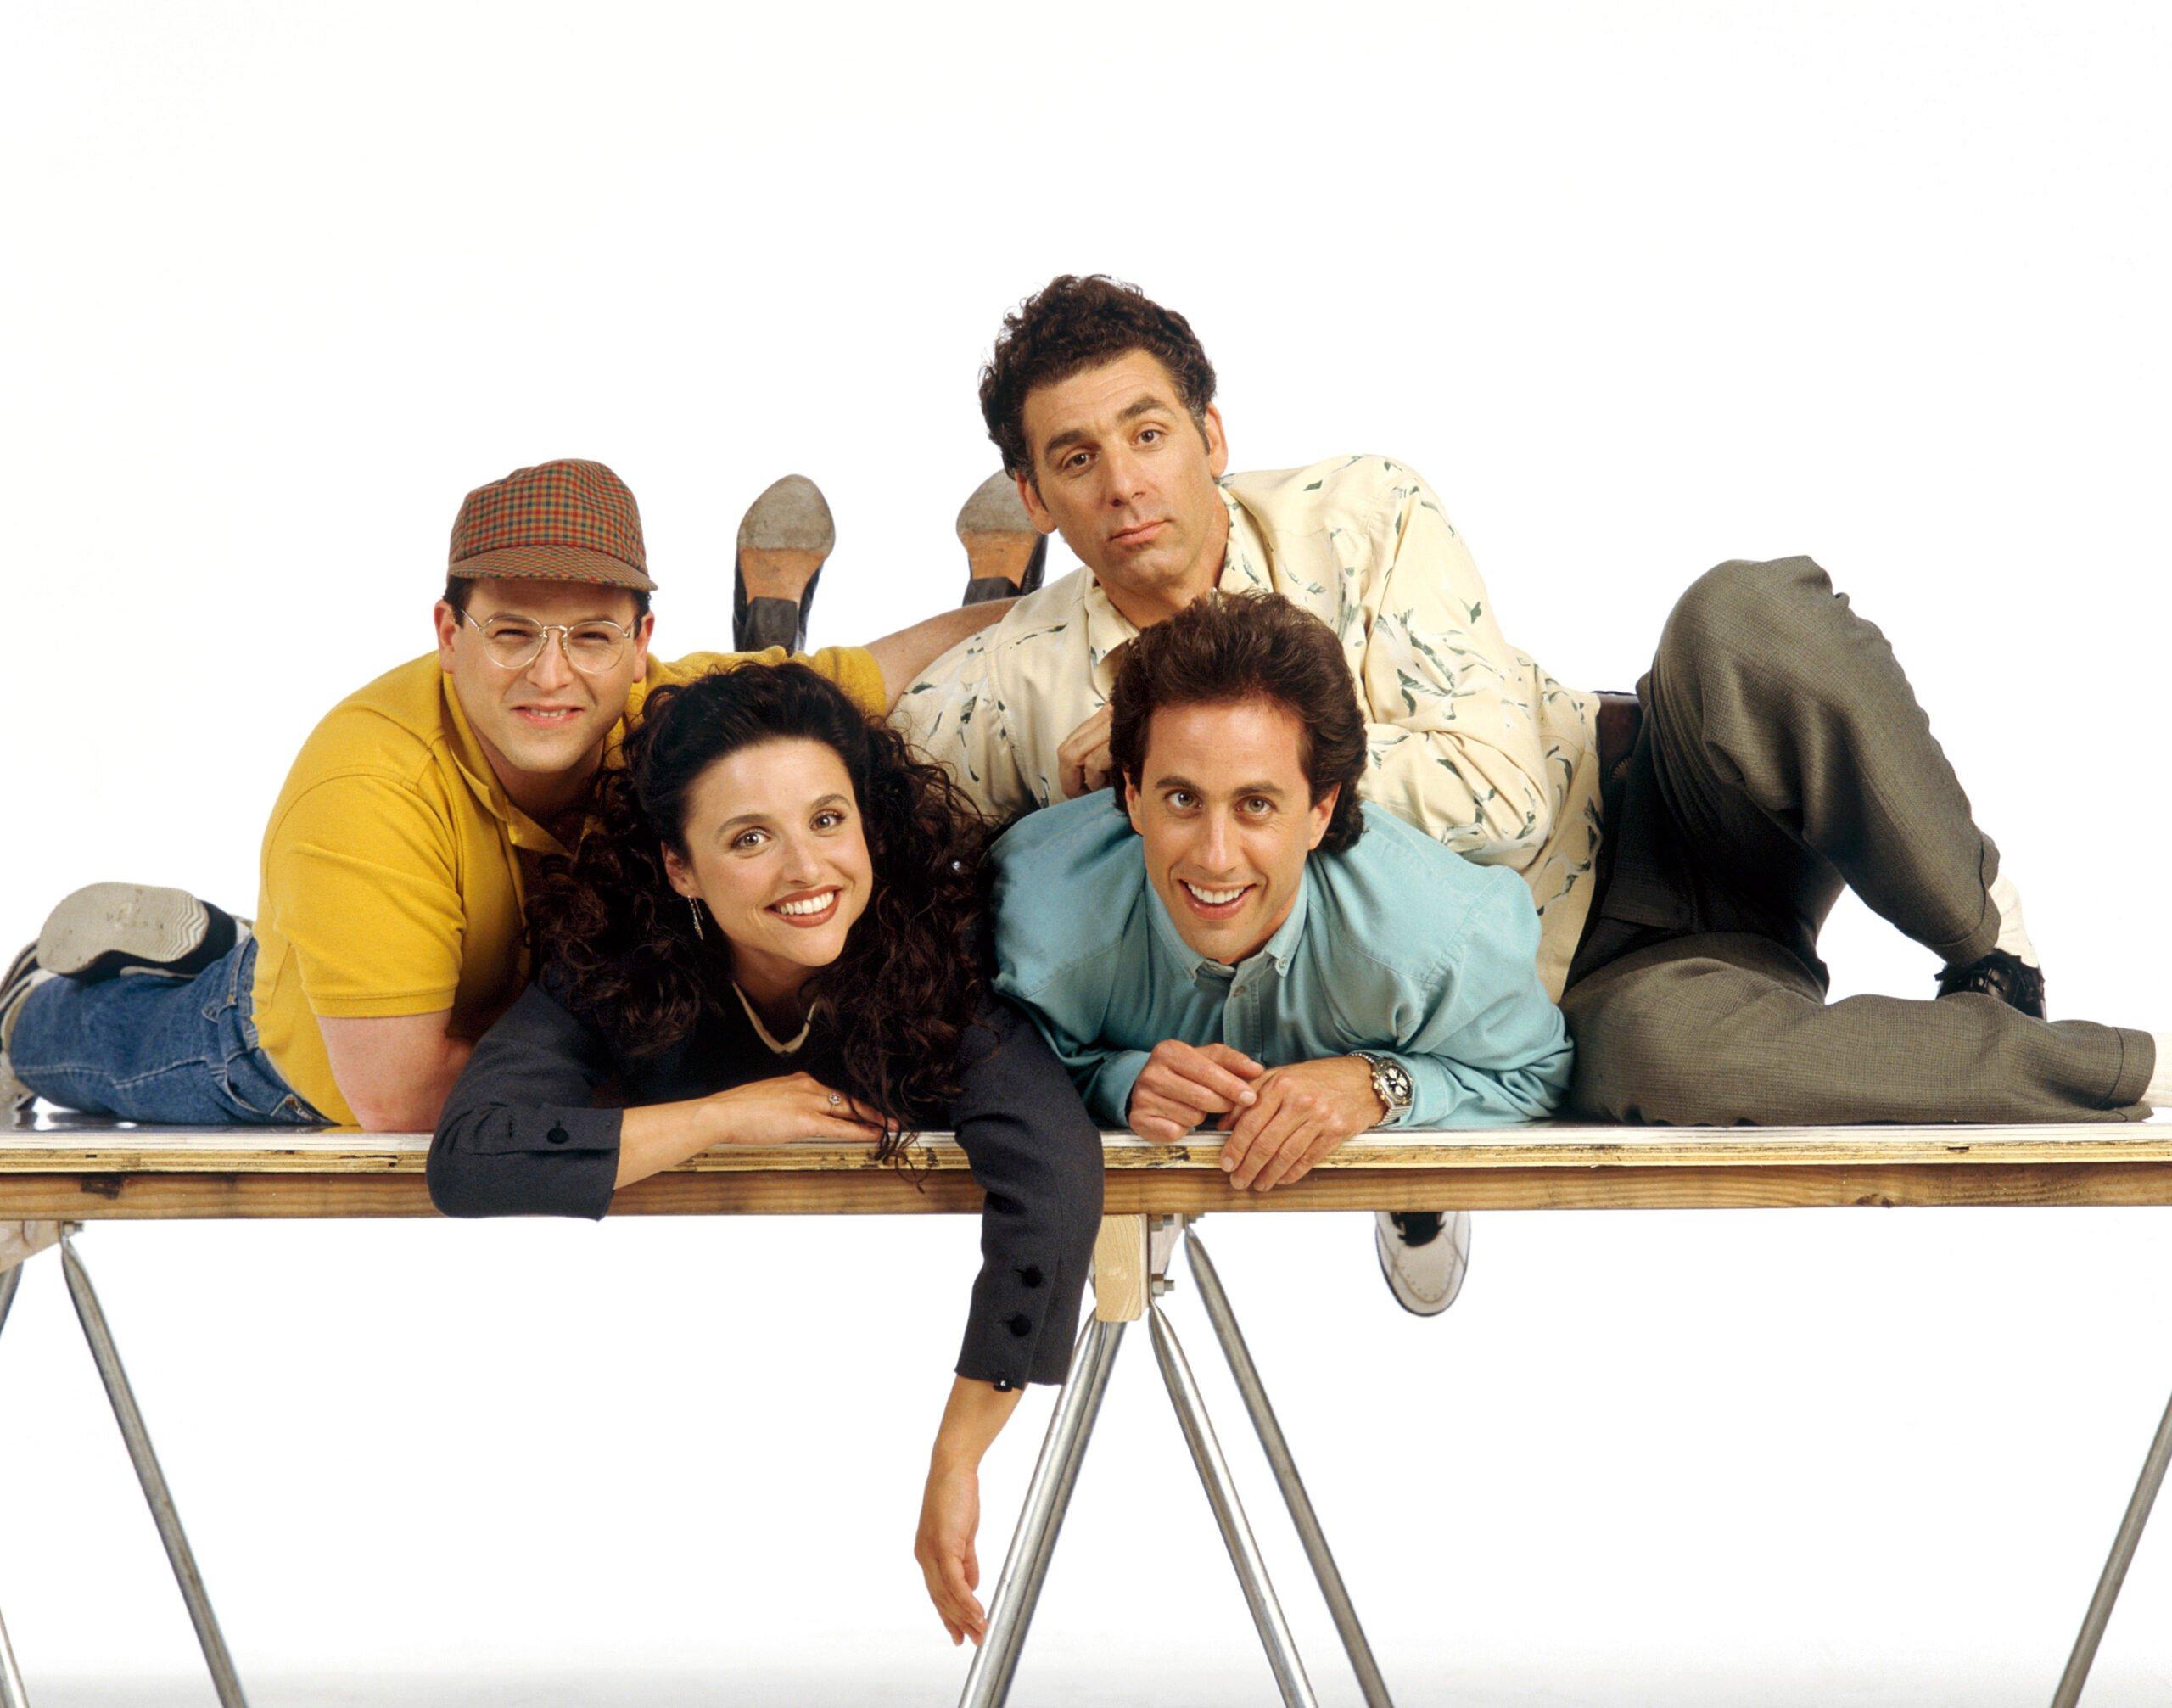 The Lasting Legacy of Seinfeld: Julia Louis-Dreyfus